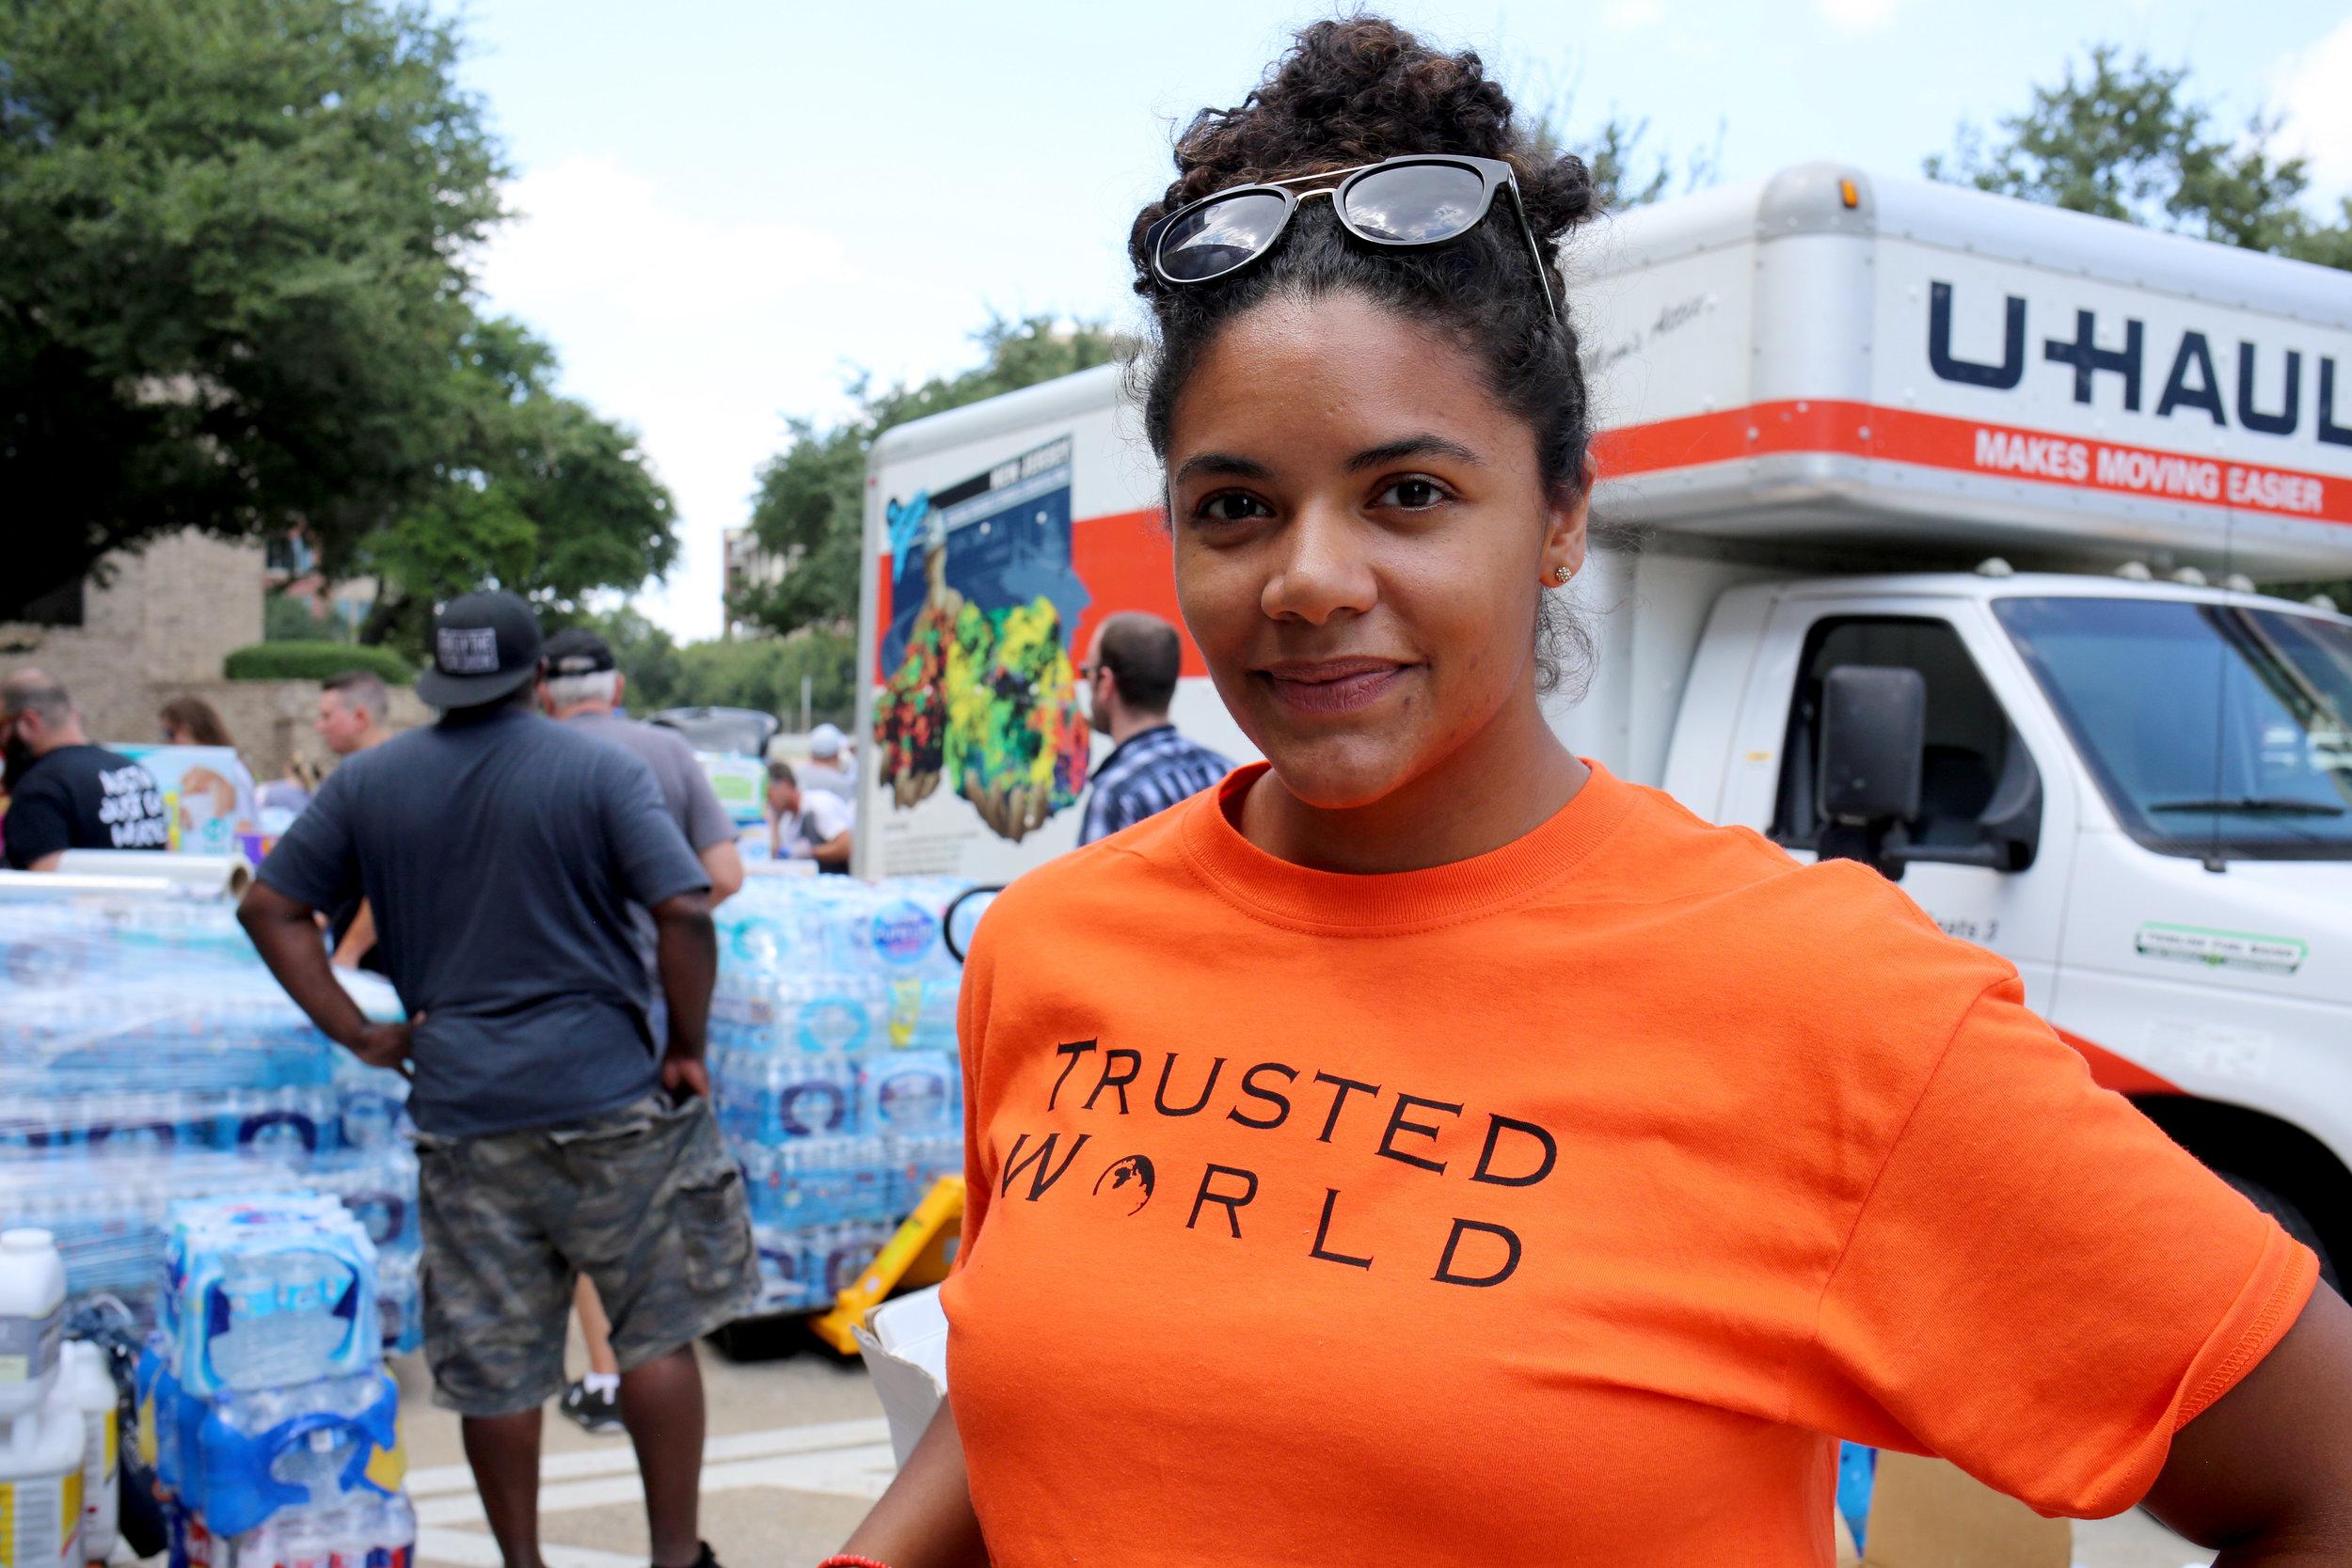 Georgia Provitt, volunteer with Trusted World donation site.